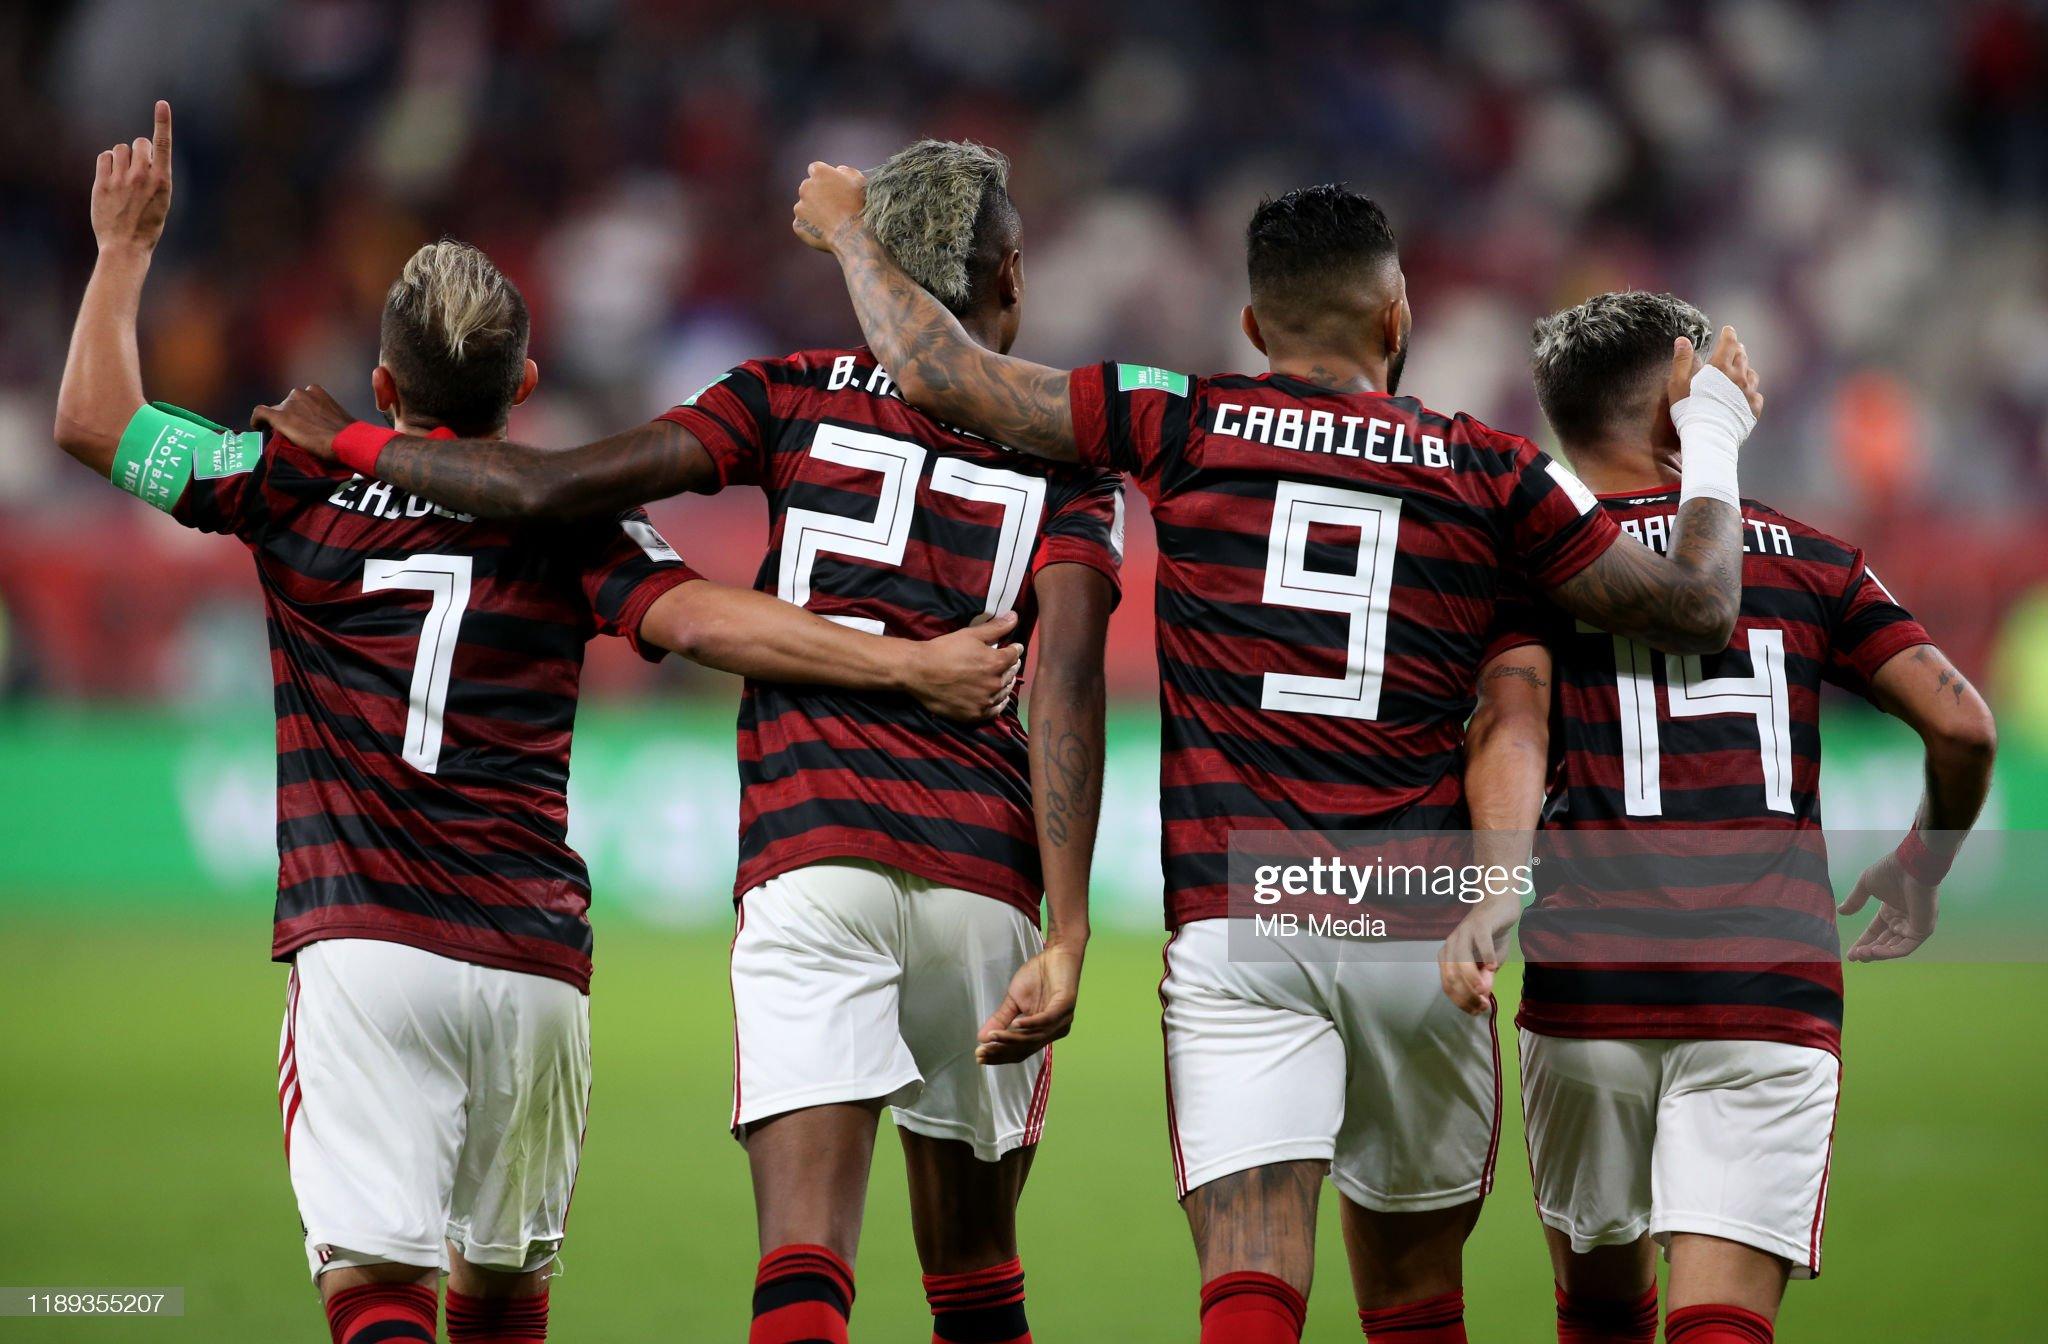 CR Flamengo and Al Hilal SFC Semi-Finals Match - FIFA Club World Cup Qatar 2019 : News Photo